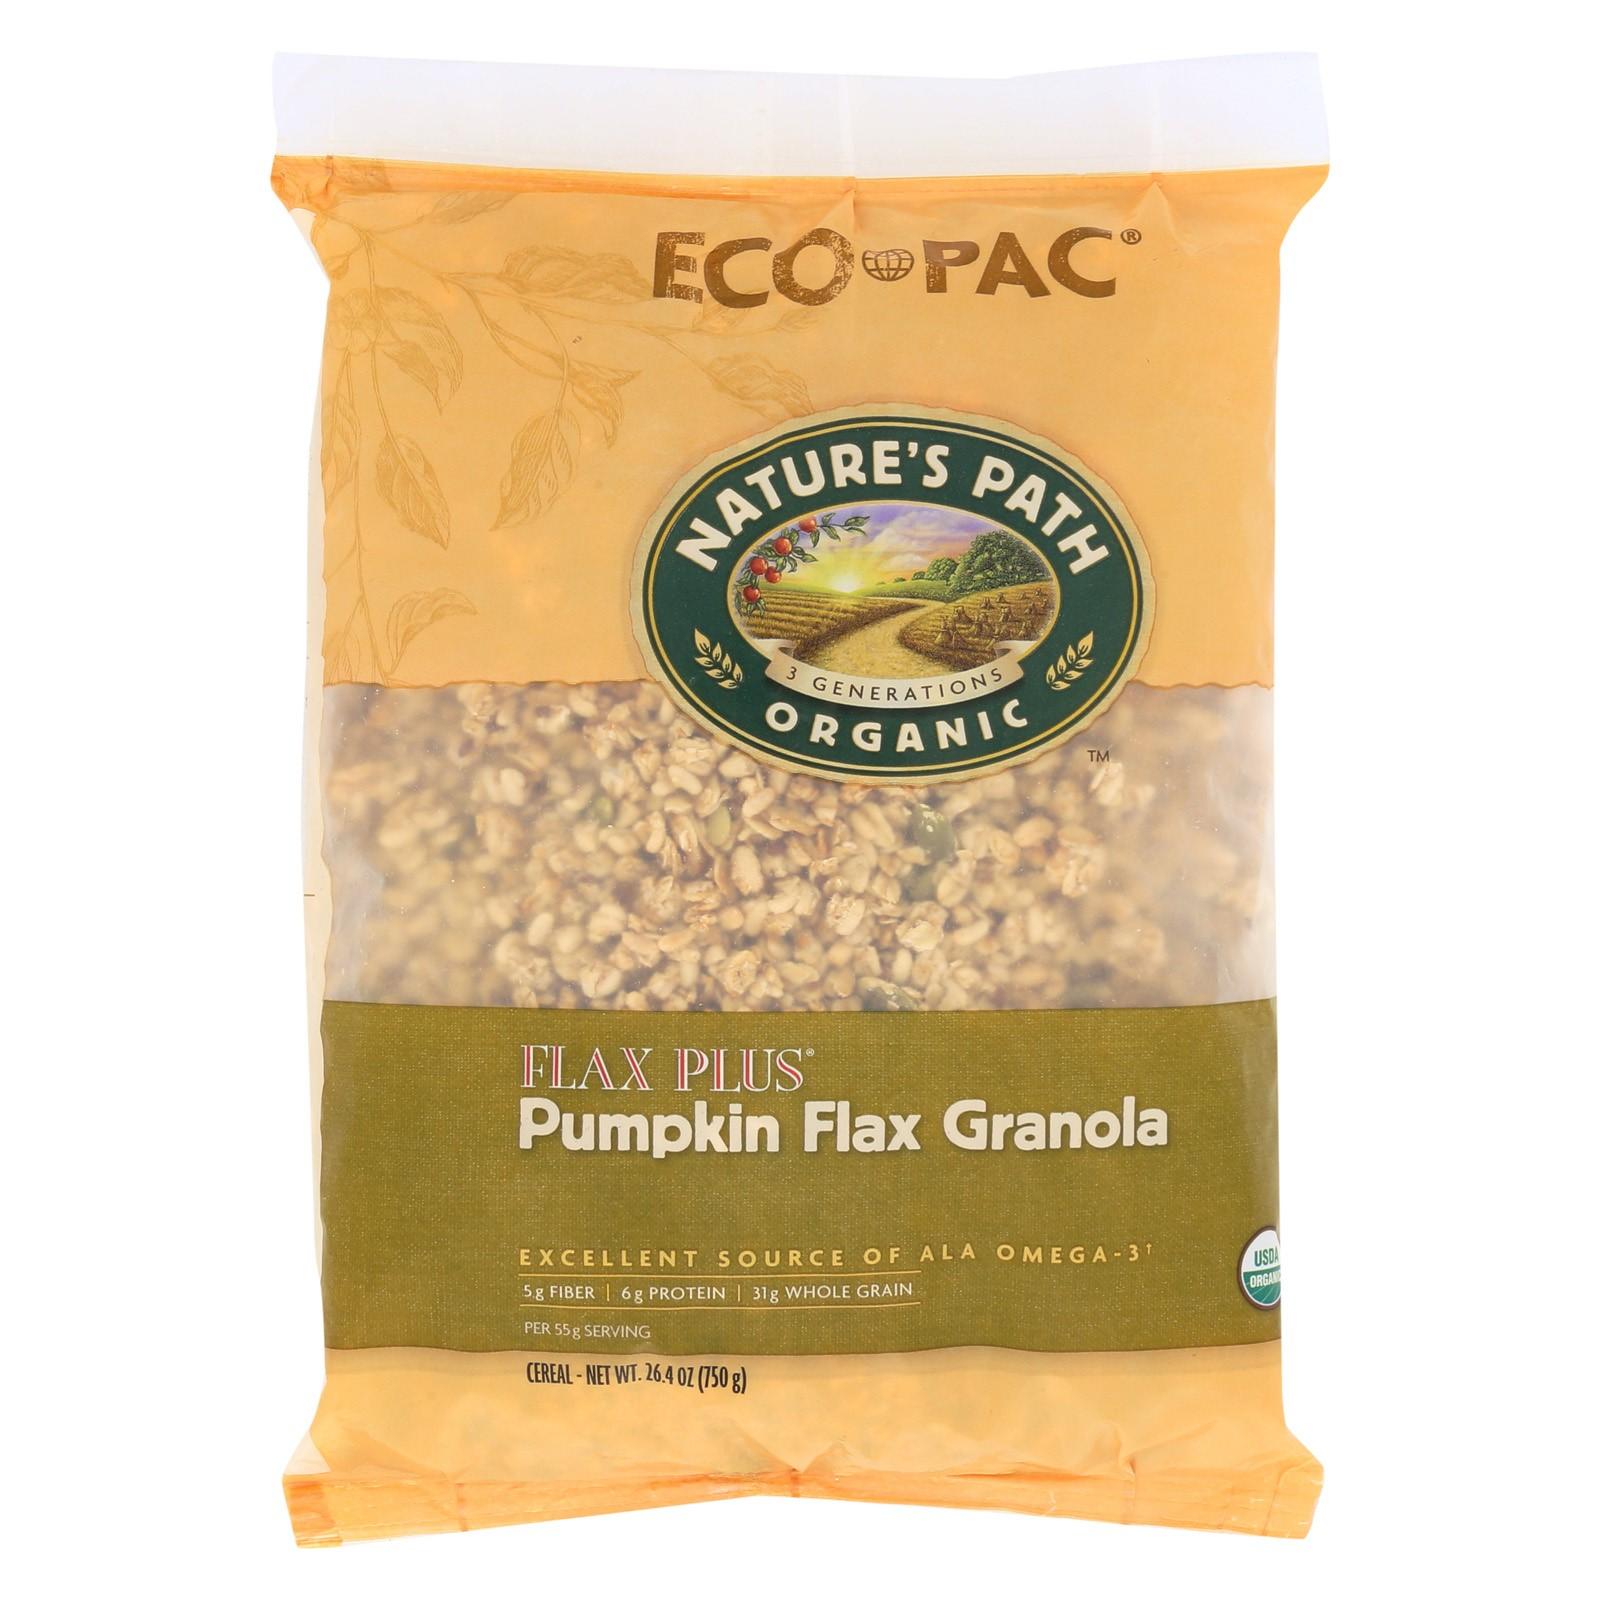 Nature's Path Organic Flax Plus, Pumpkin Granola Cereal, 26.4 Oz